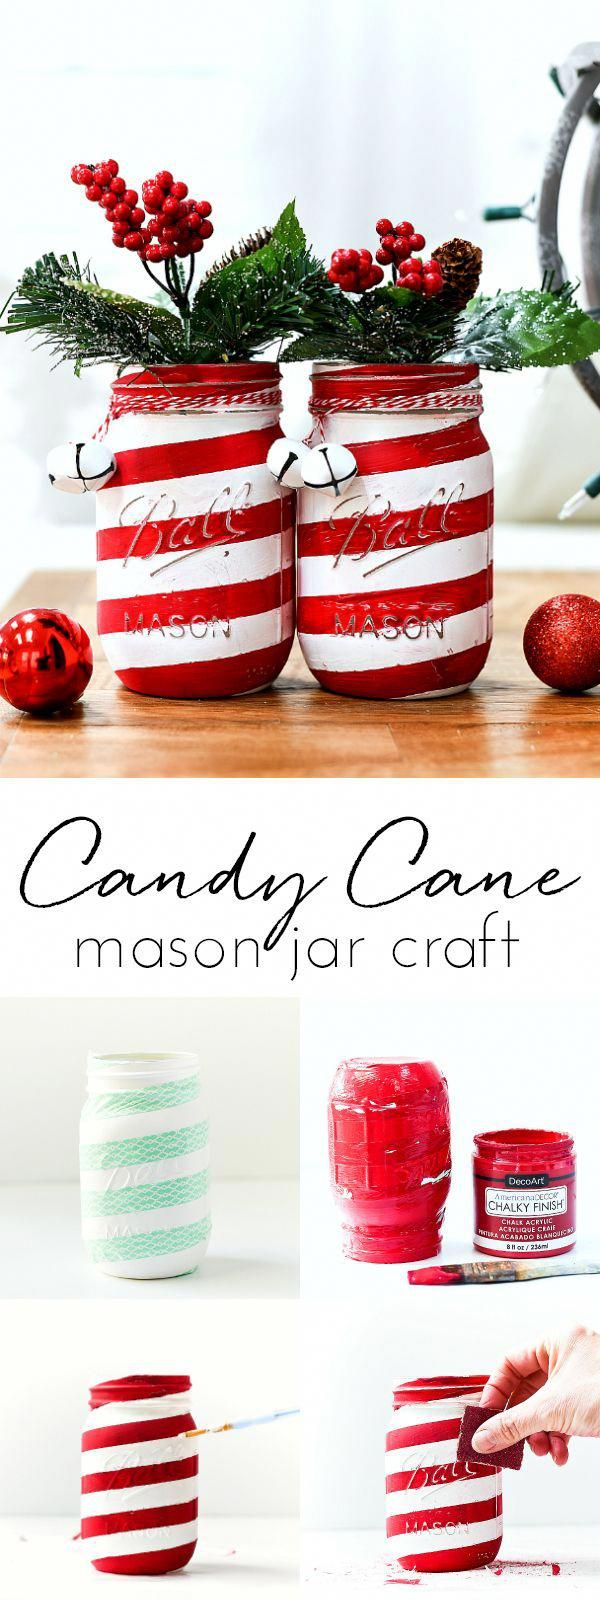 Christmas Ideas For Toddler Boy Christmas Movies Mistletoe Christmasgiftideas Mason Jar Christmas Crafts Christmas Jars Mason Jar Crafts Diy